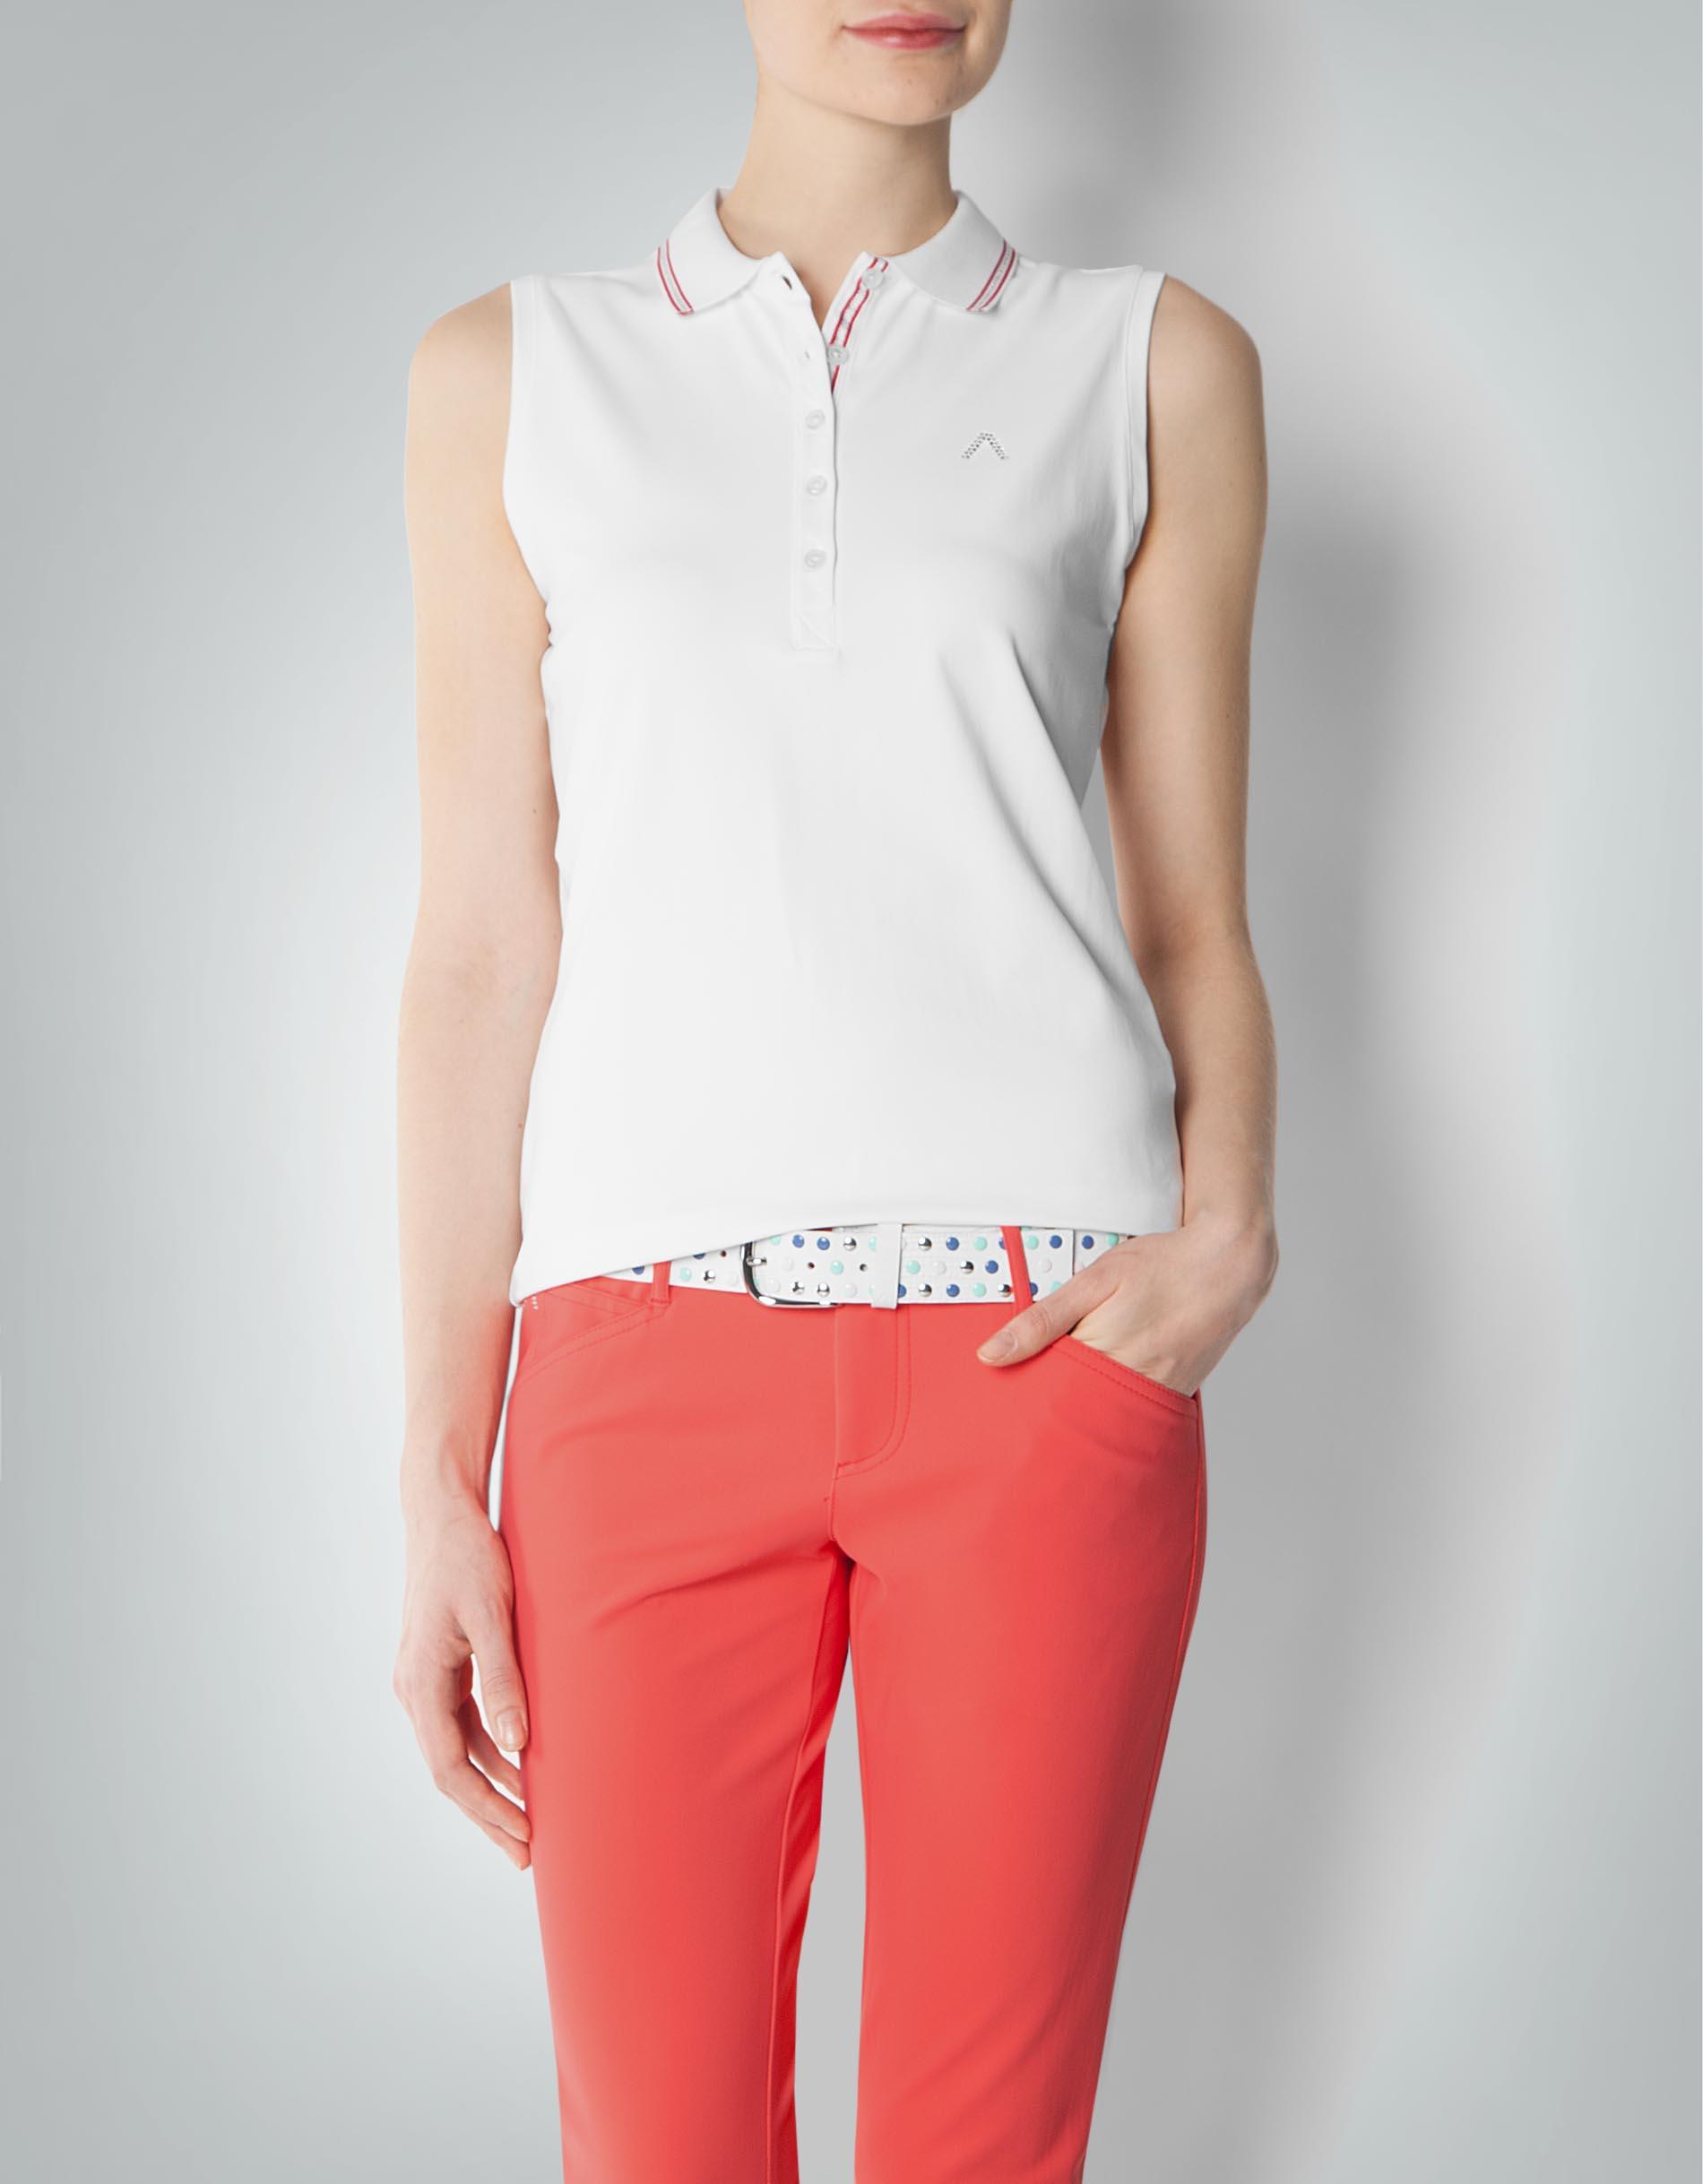 alberto golf damen dry c samanta polo shirt aus. Black Bedroom Furniture Sets. Home Design Ideas